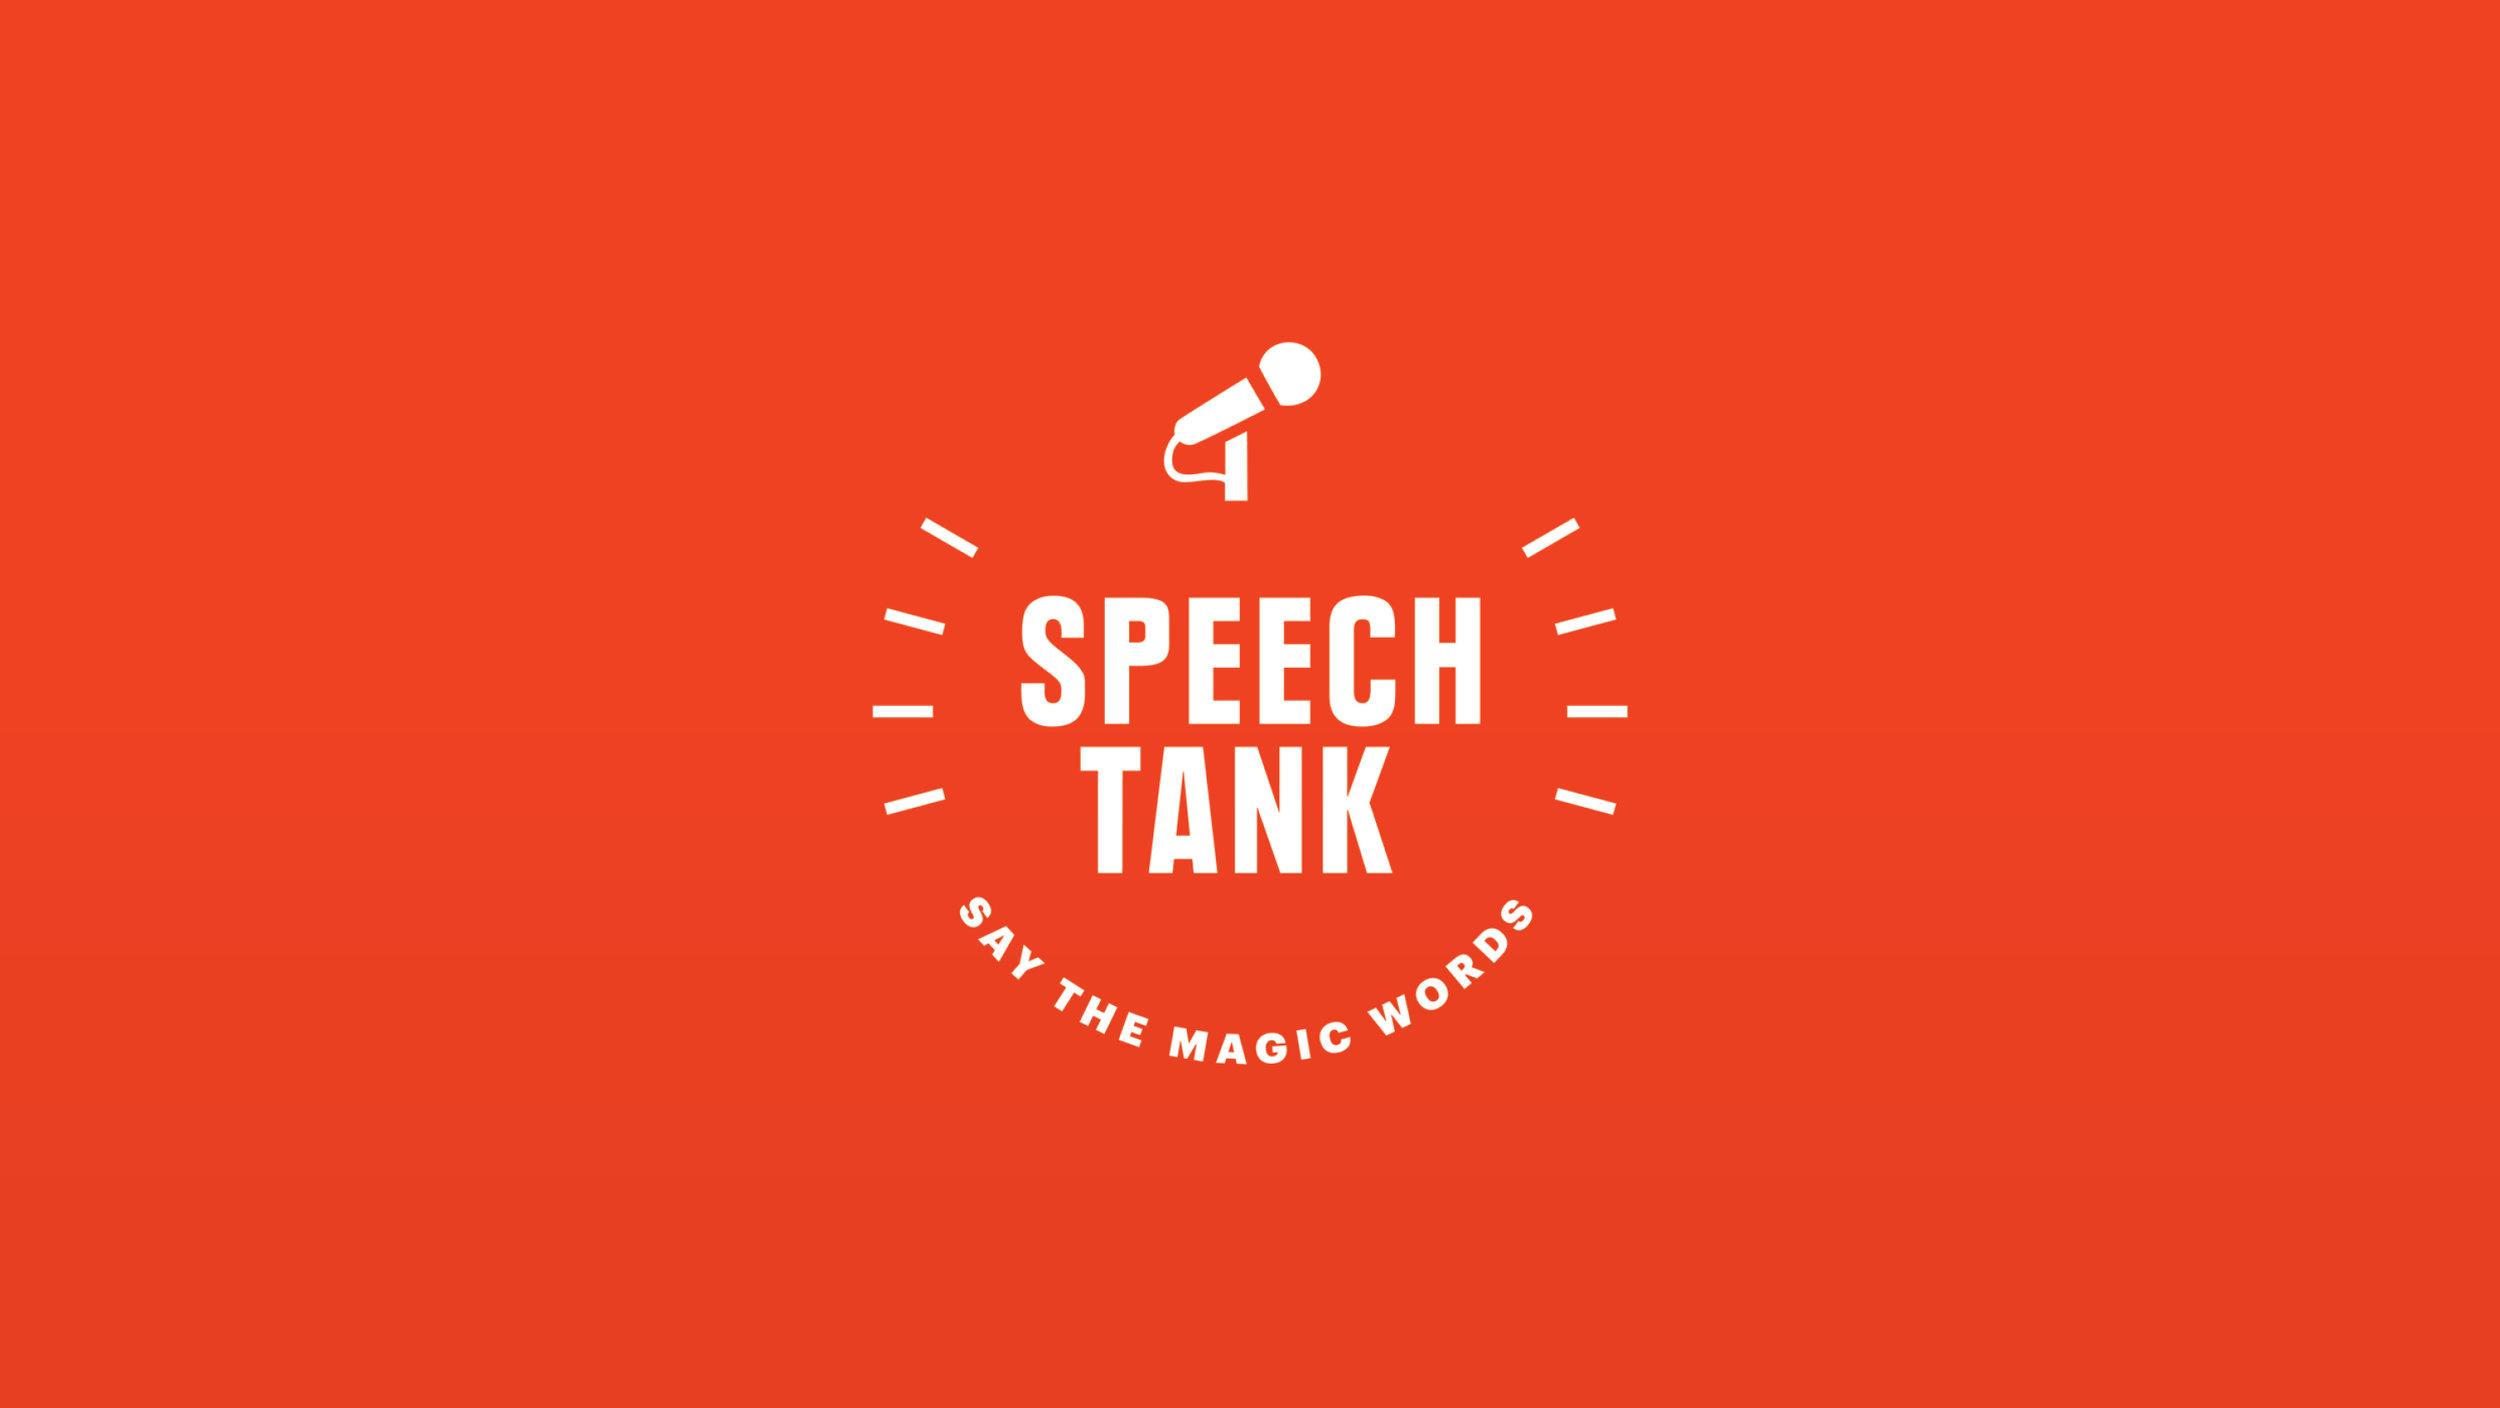 Speech Tank_deck_still_01.jpg